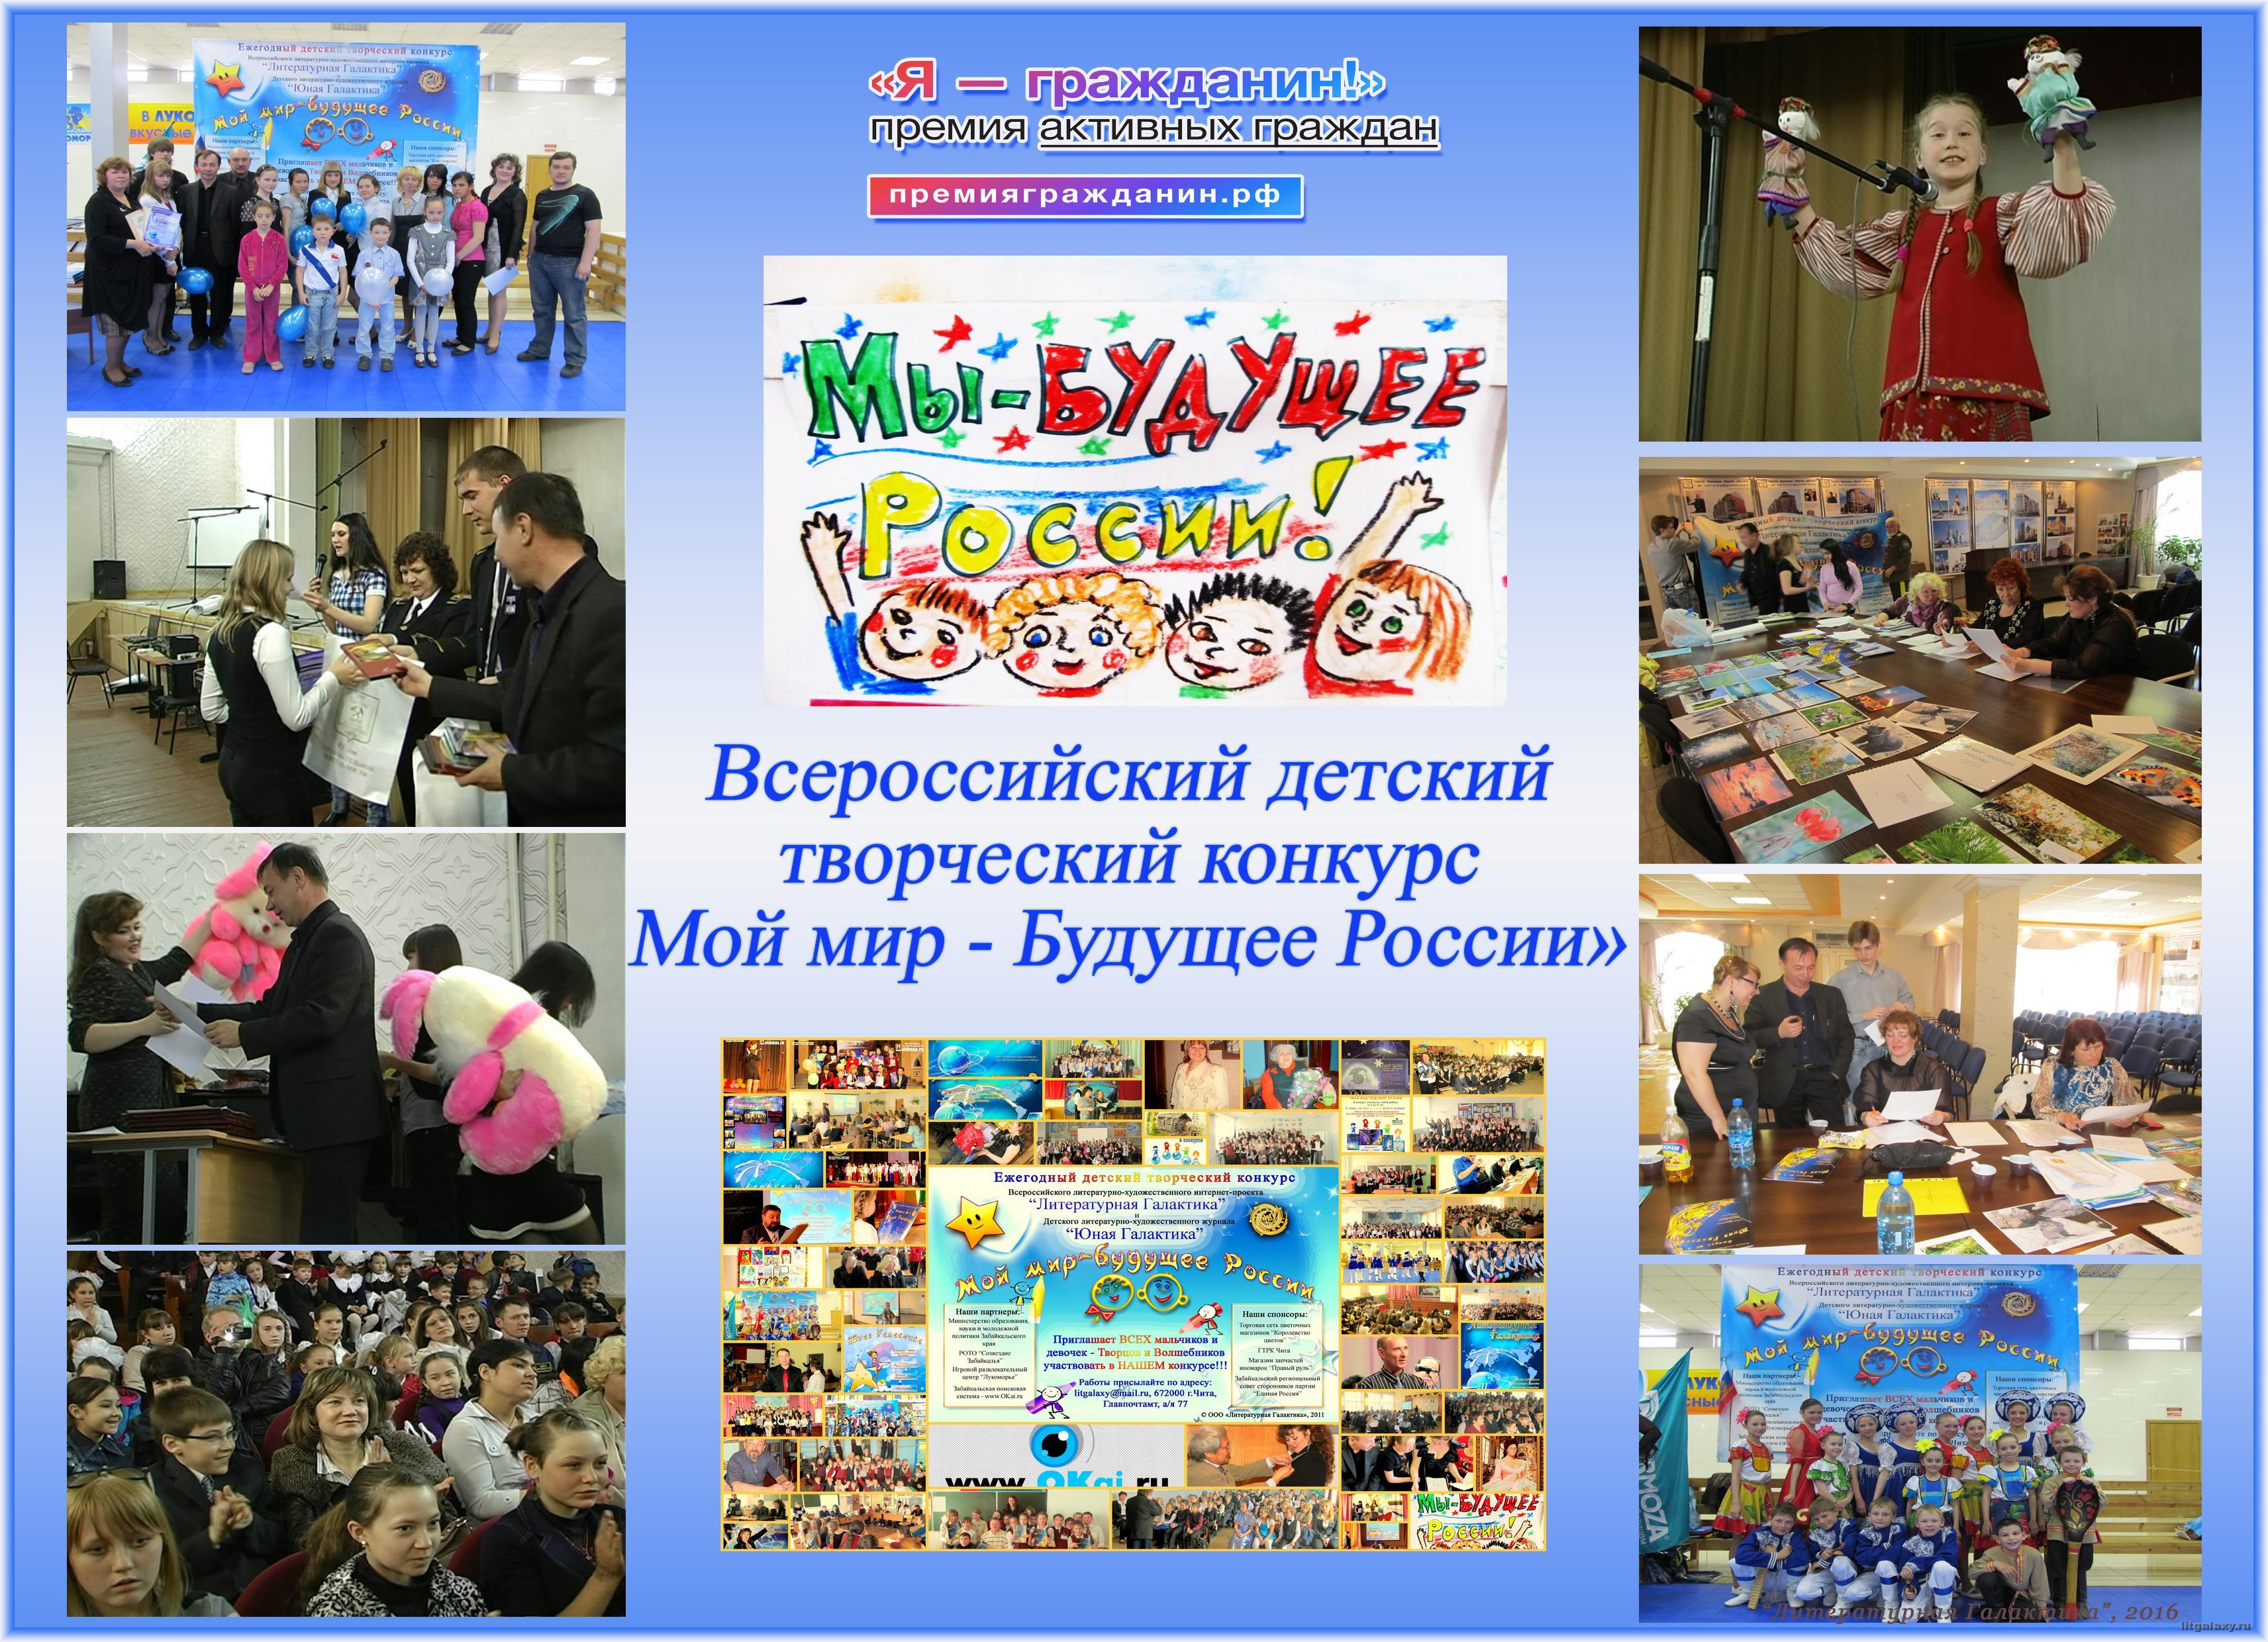 http://litgalaxy.p.fl1.fo.ru/image/chunk42/1663896/blog_1639398/14.jpg_1478653225.jpg